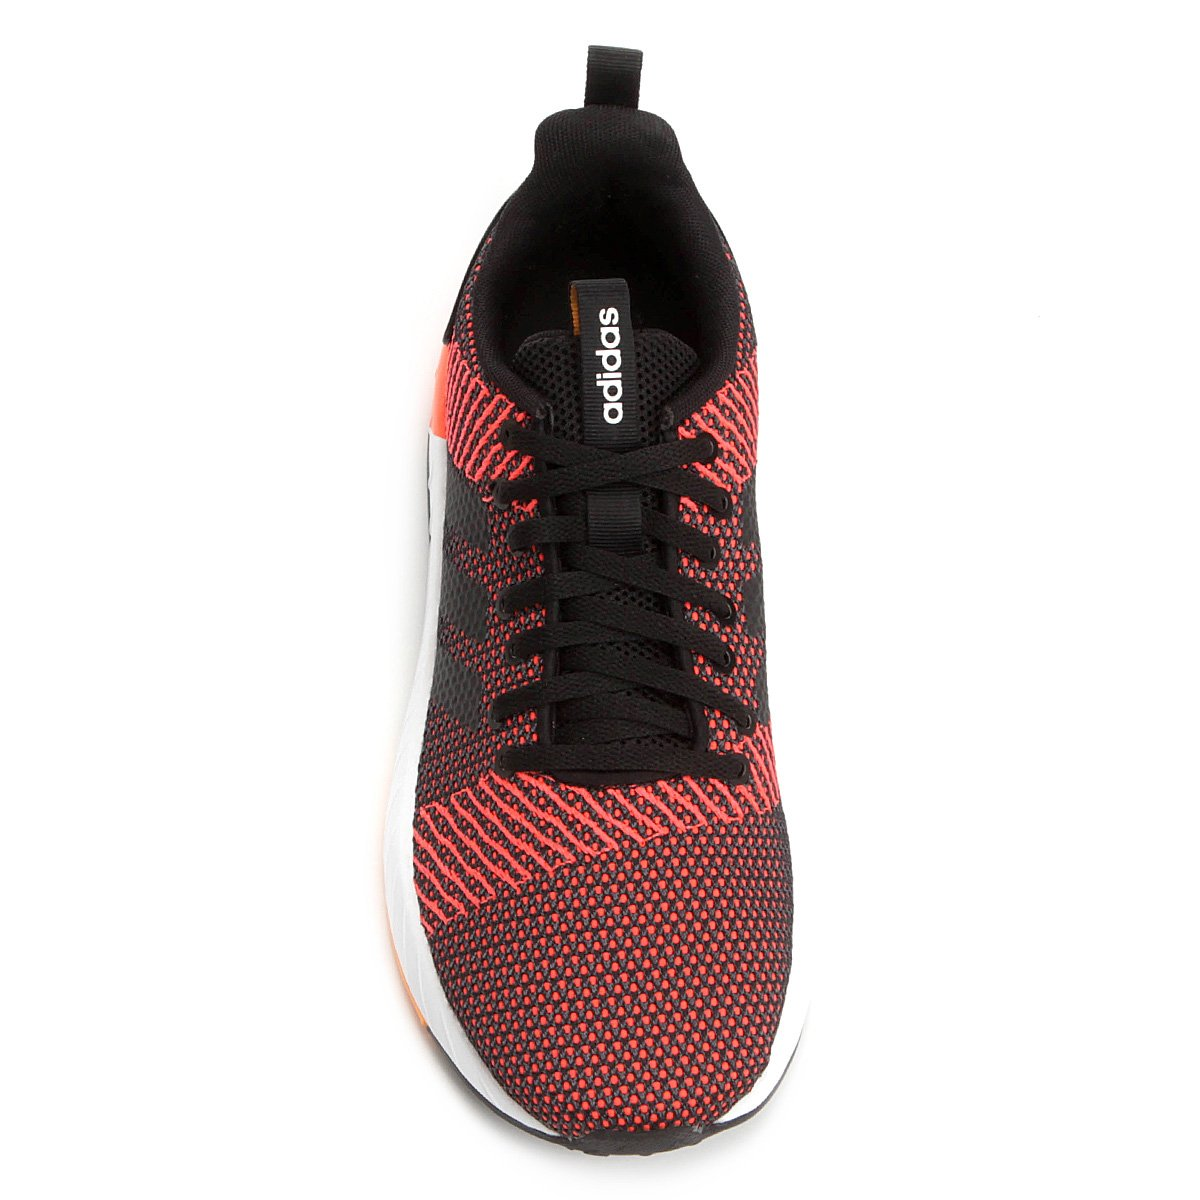 Adidas Drive Laranja Tênis Masculino e Byd Tênis Adidas Preto Response qEBSpwTwI